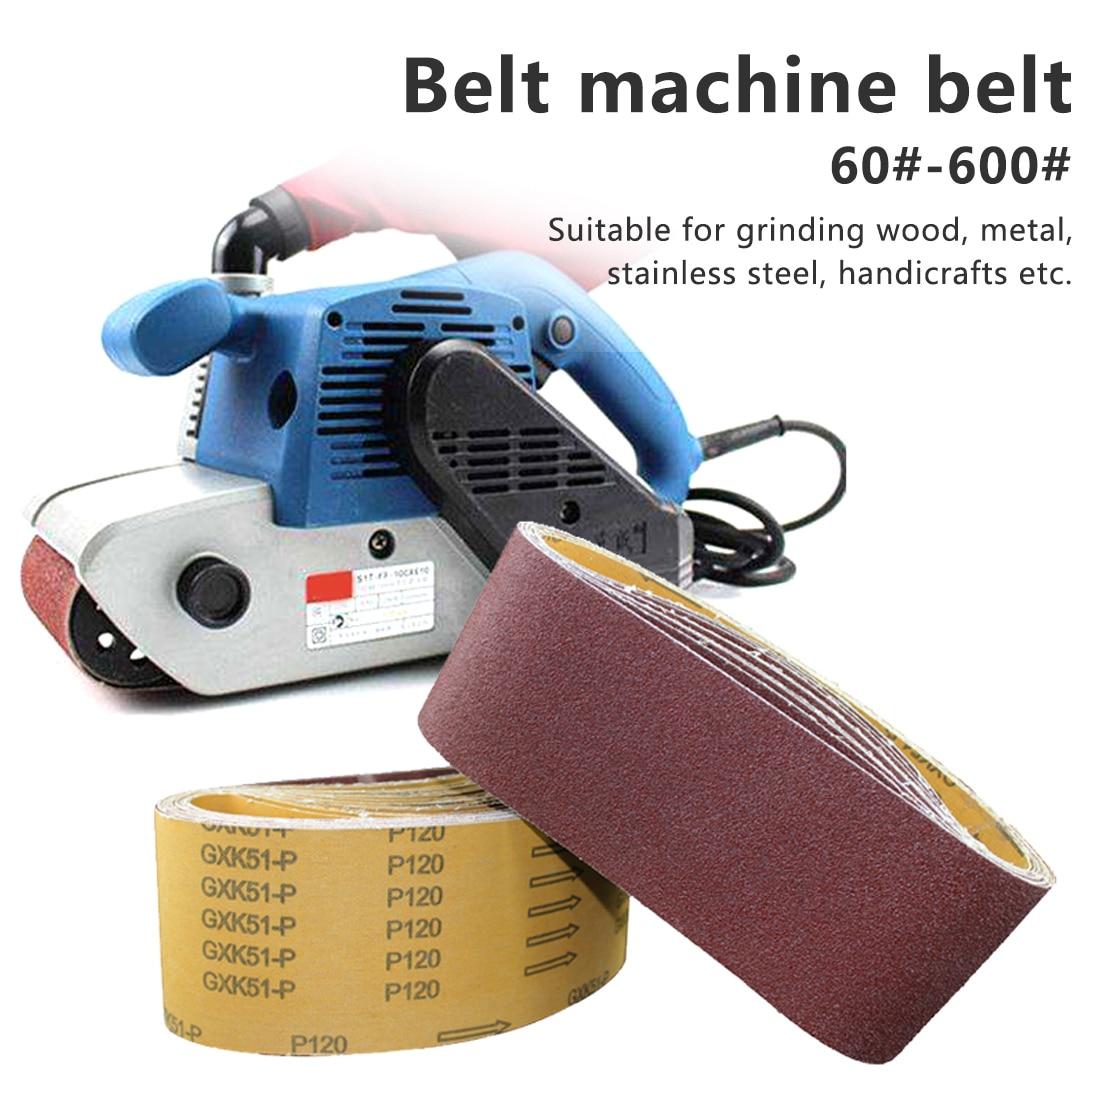 Abrasive Bands 60-600 Grits Sandpaper Sanding Belts For Sander Power Rotary Tools Dremel Accessories Abrasive Tool